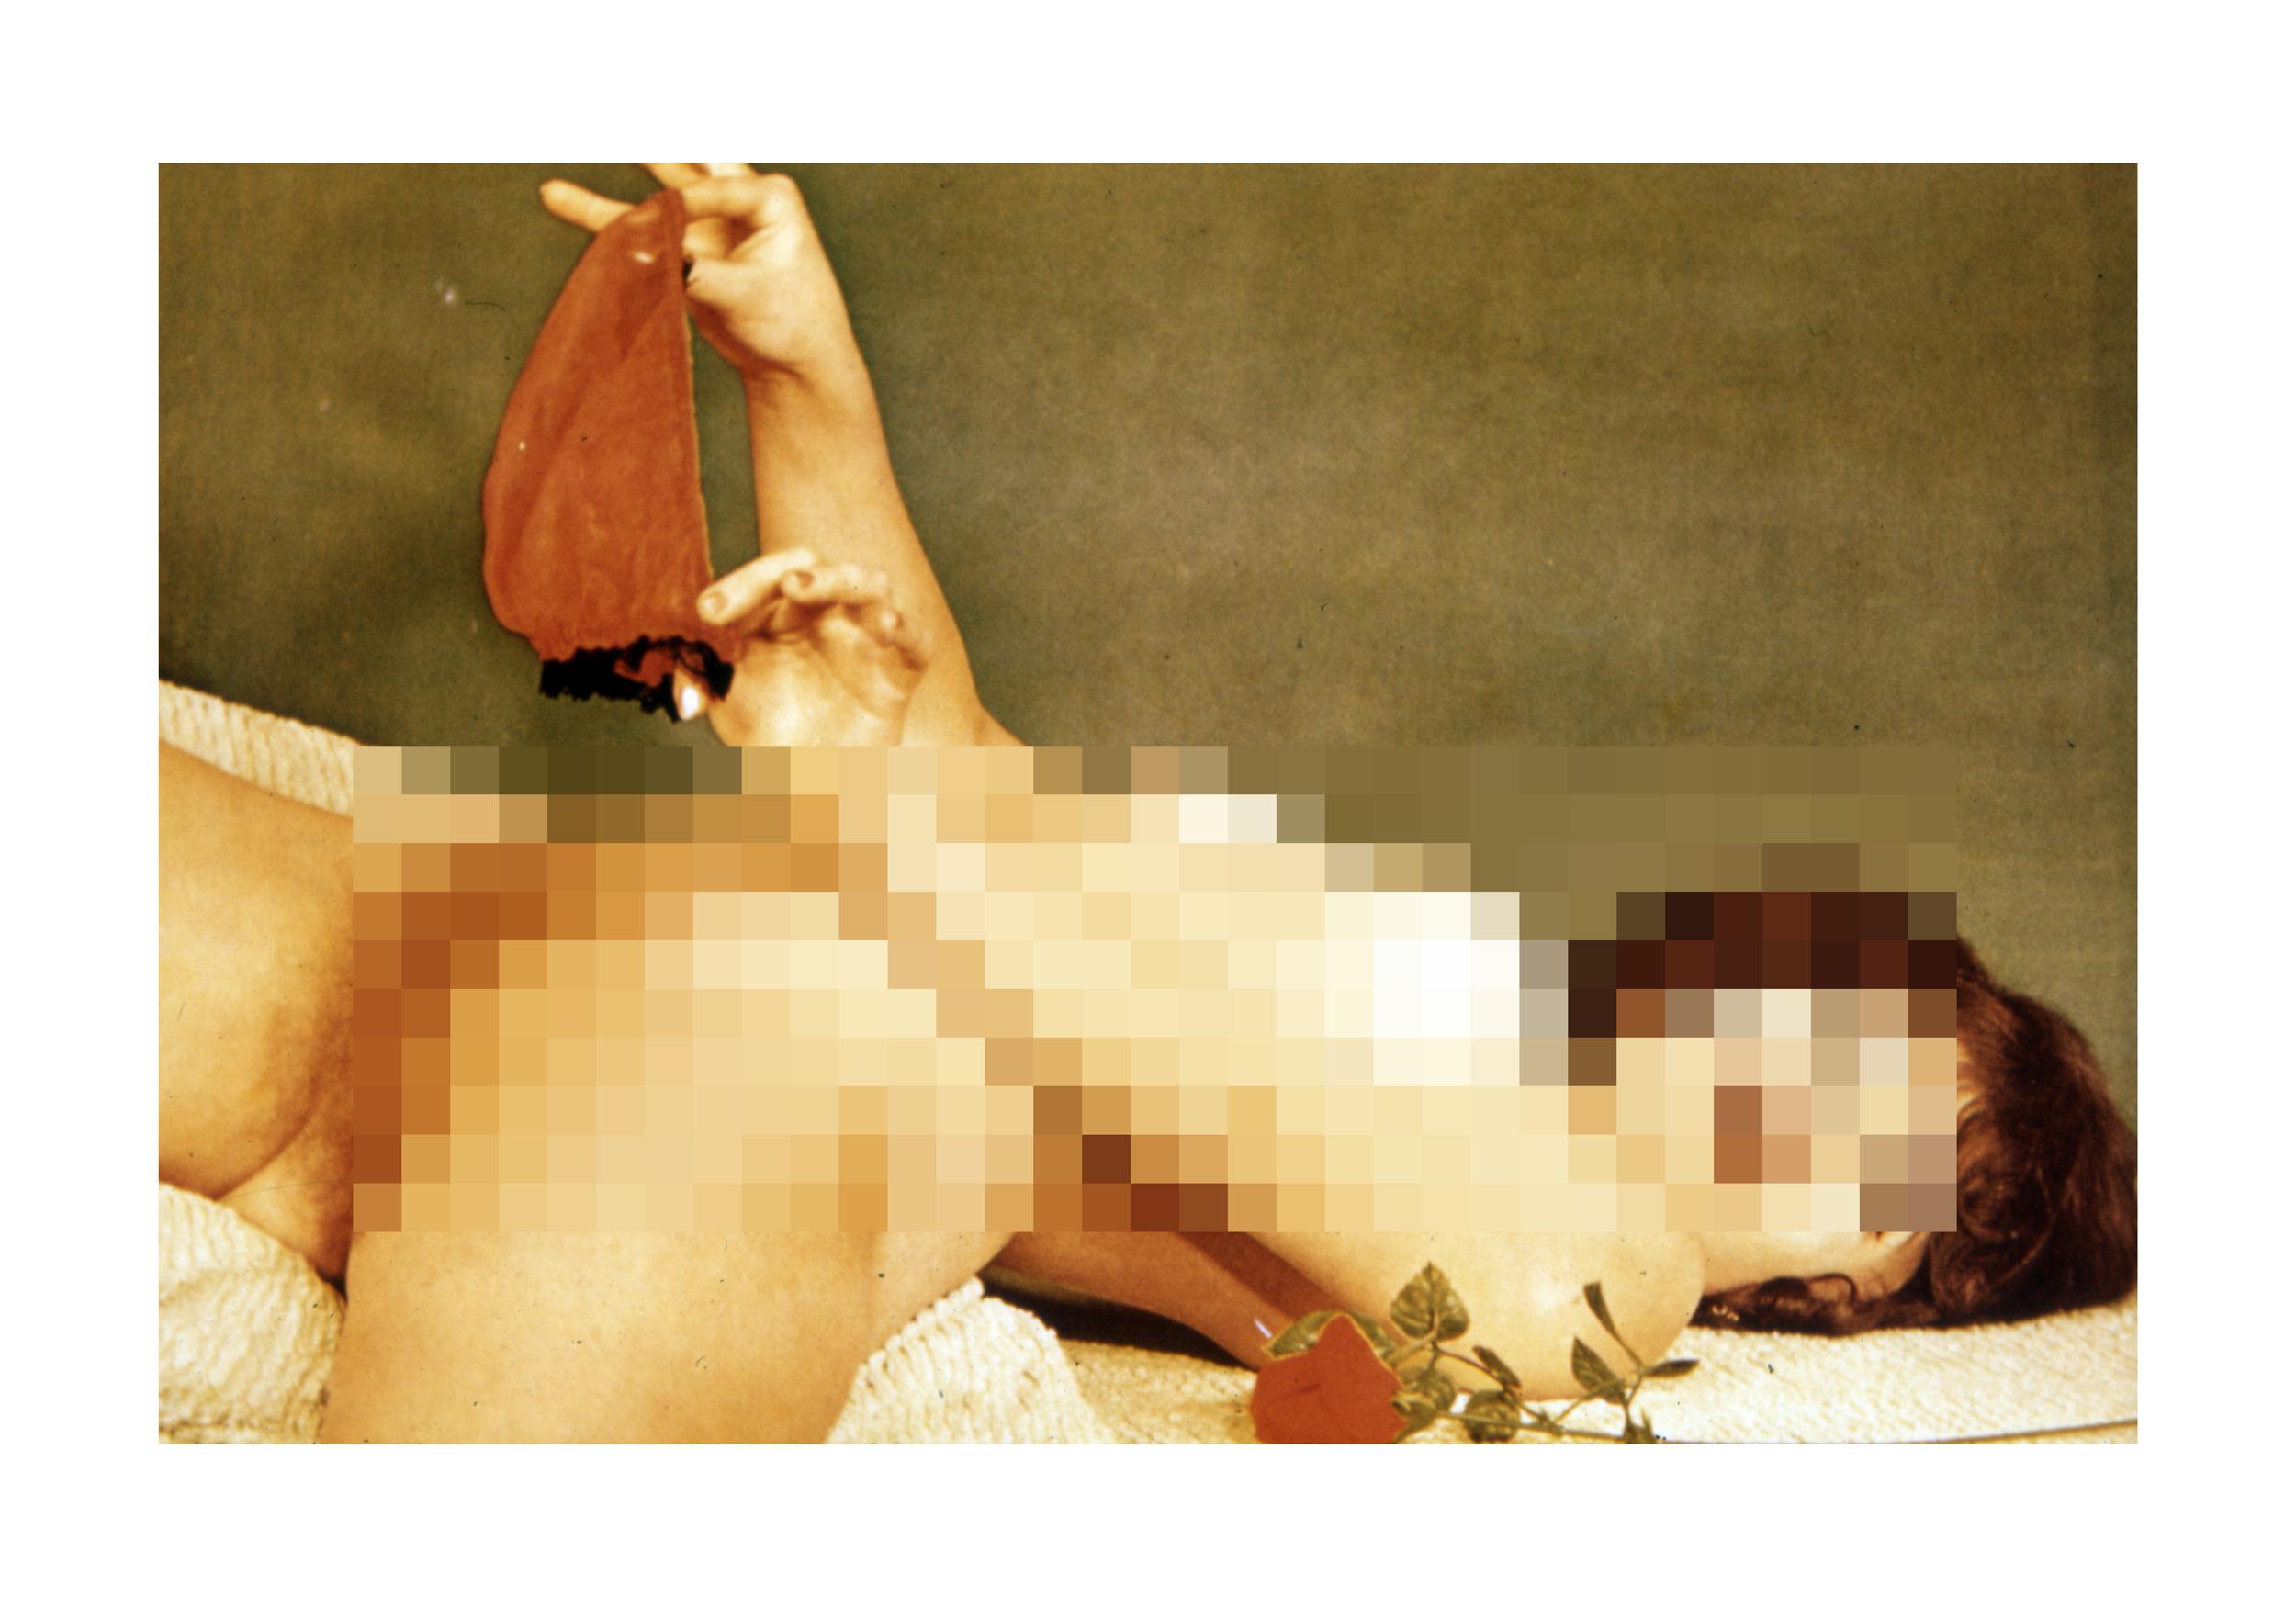 Untitled (n174), 2014